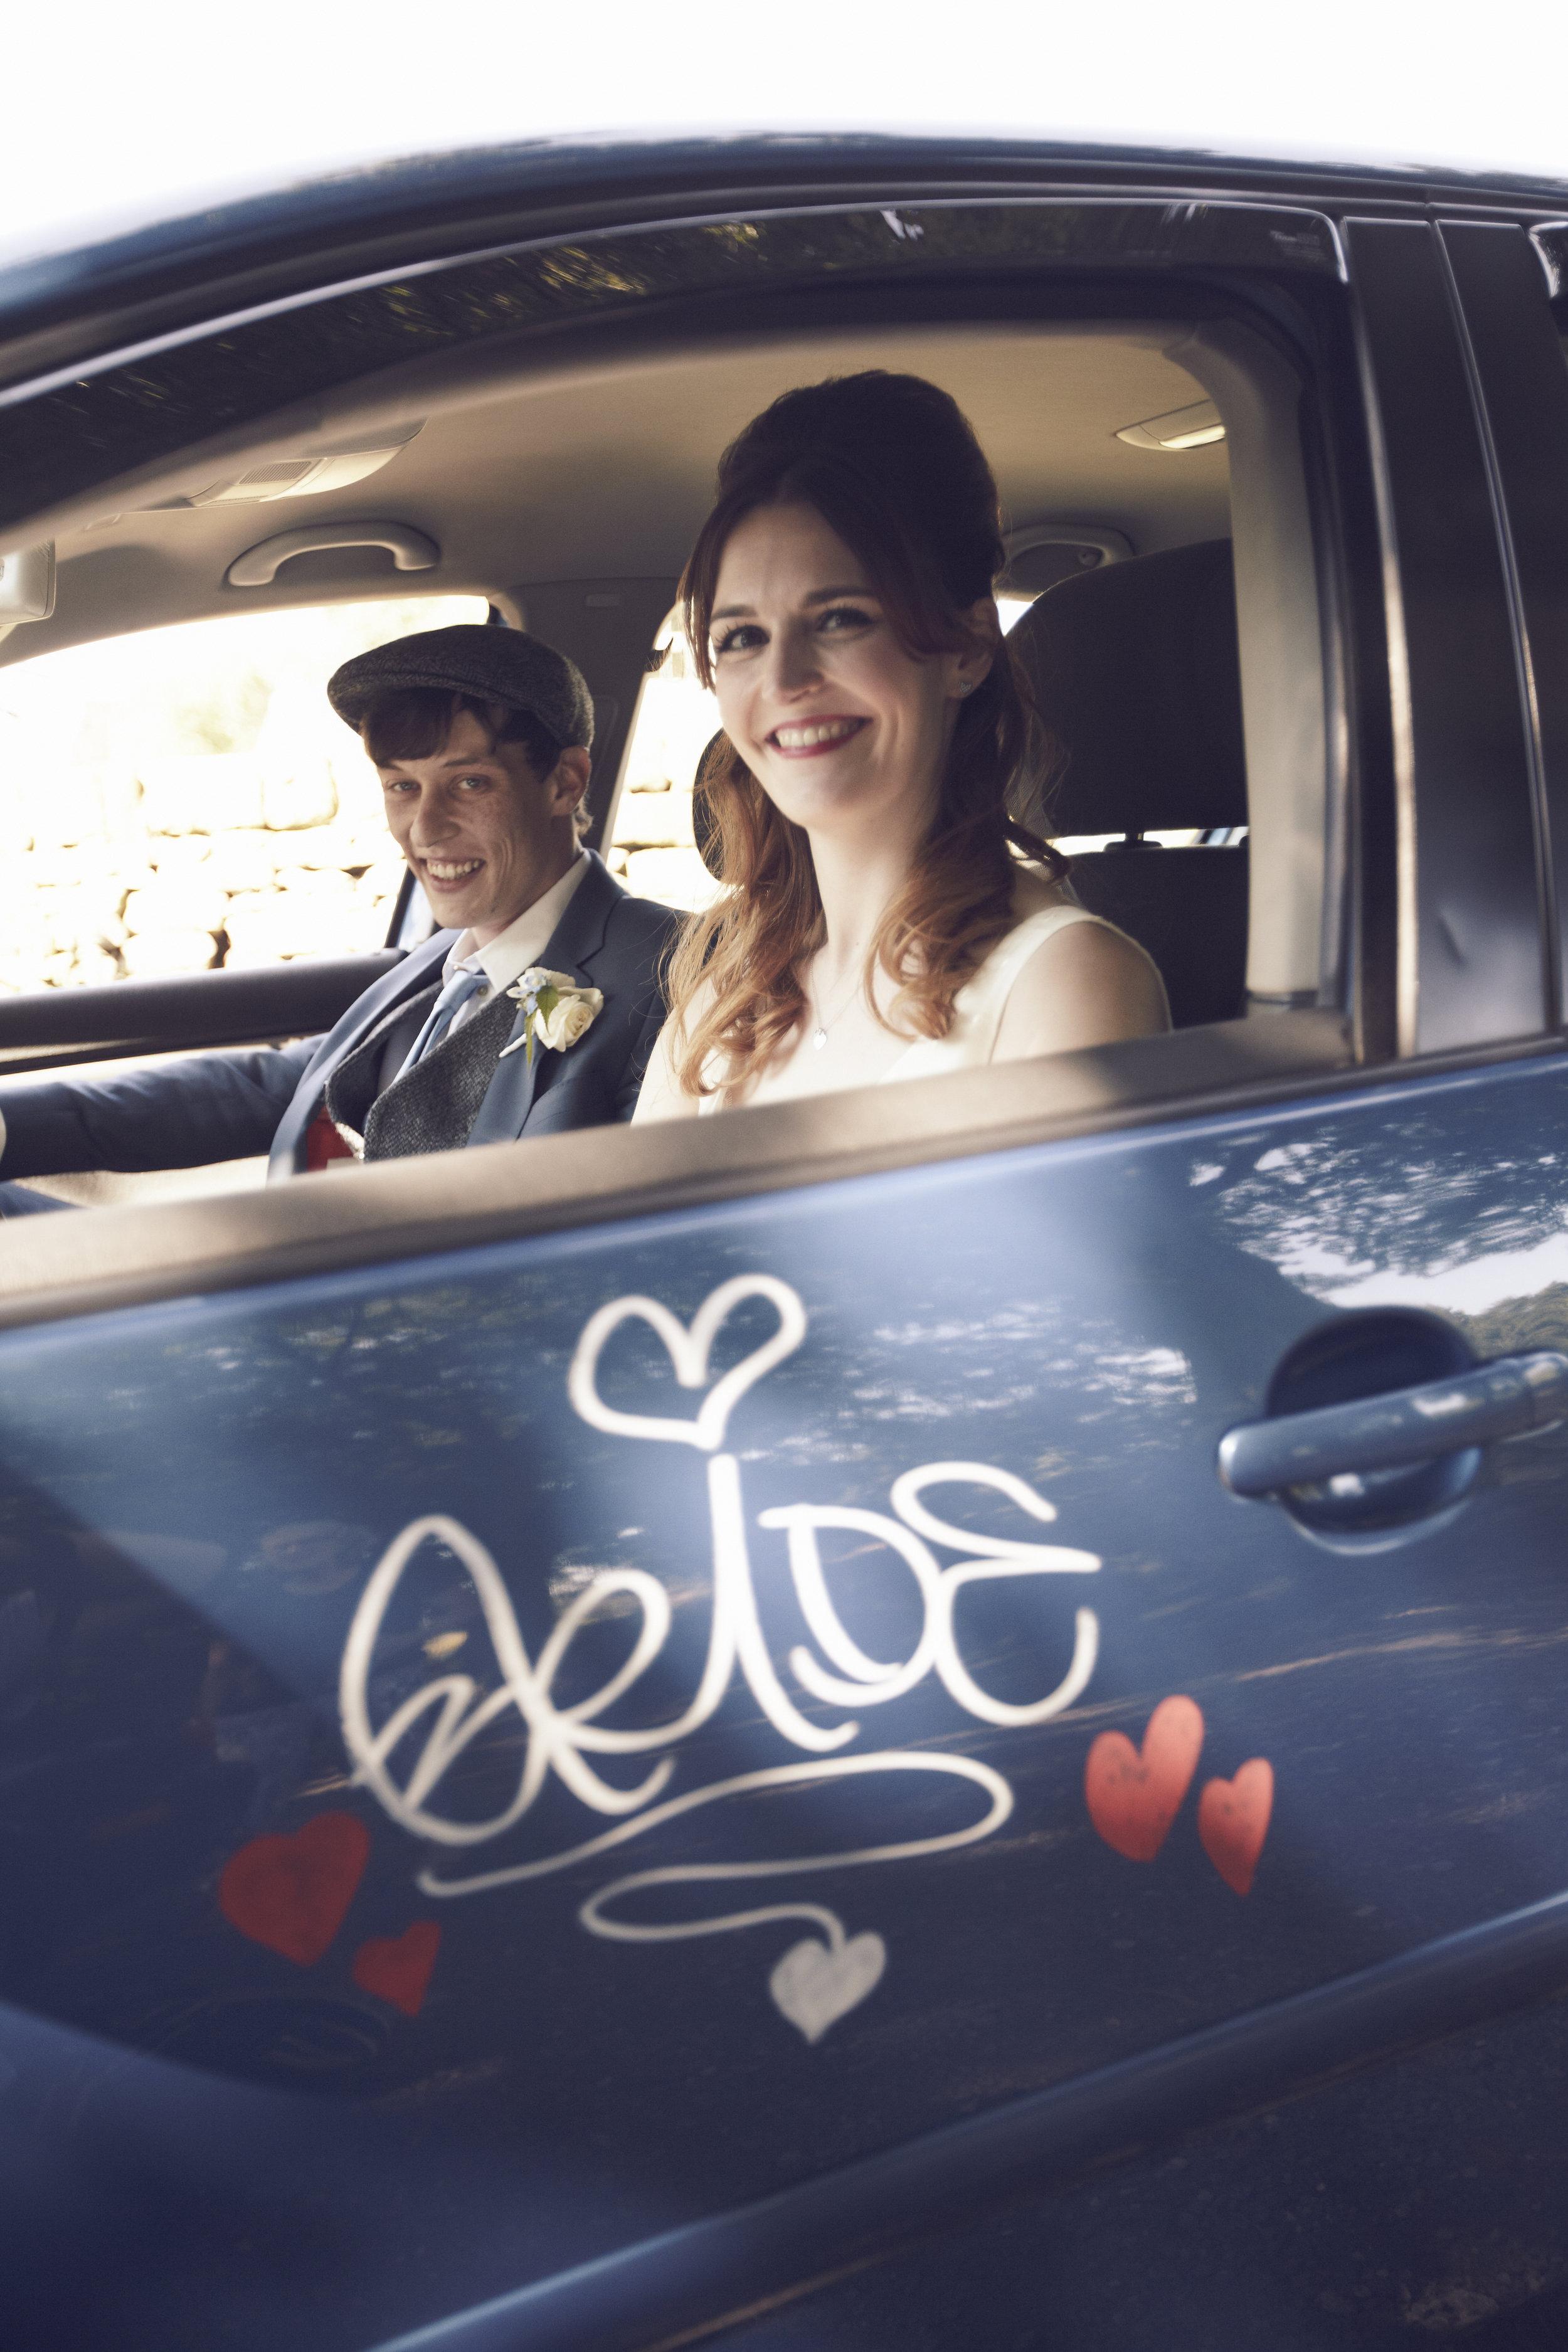 Suzi-Matlock-Polka-Dot-Bespoke-Wedding-Dress-High-Low-Susanna-Greening-Designs-Derbyshire-13